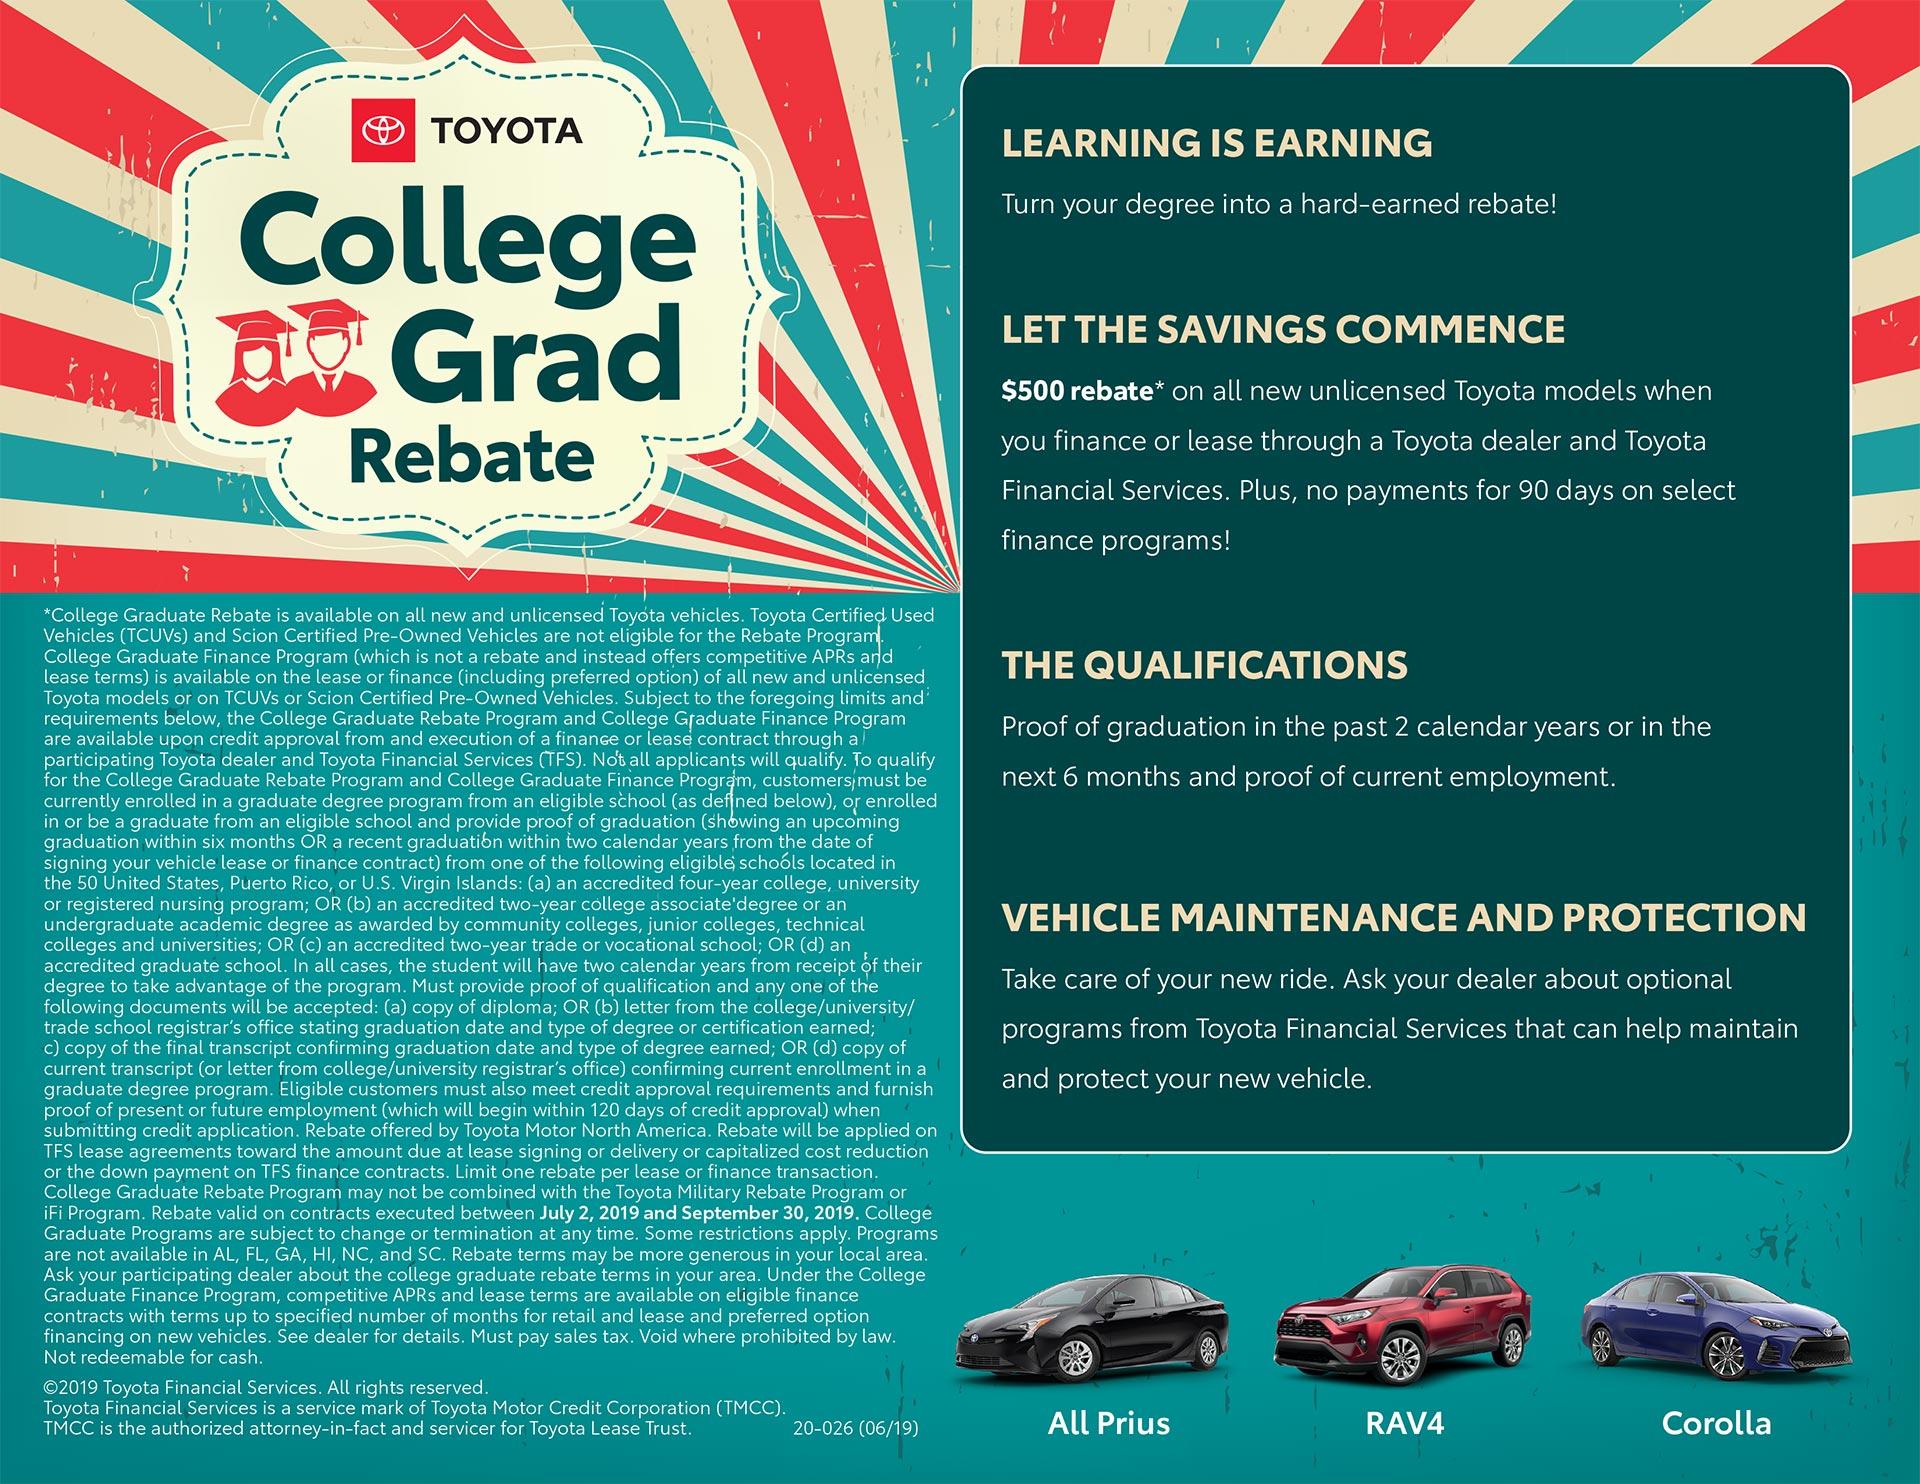 Toyota College Grad Rebate